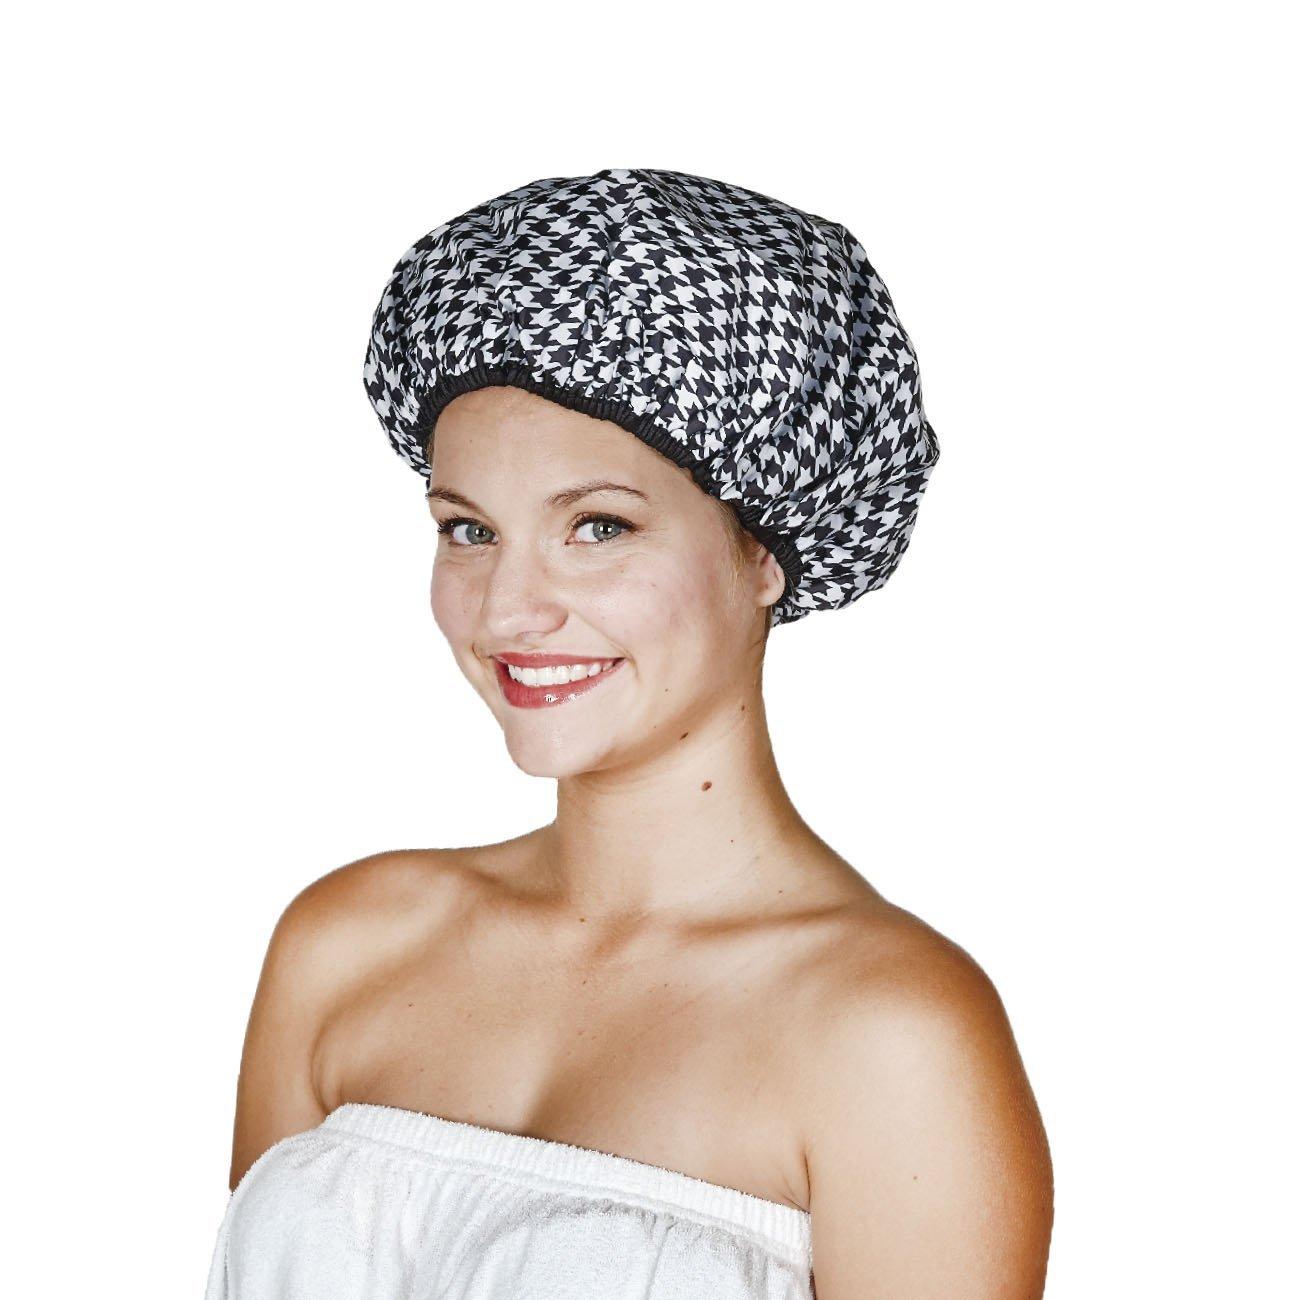 Terry line shower cap blowout